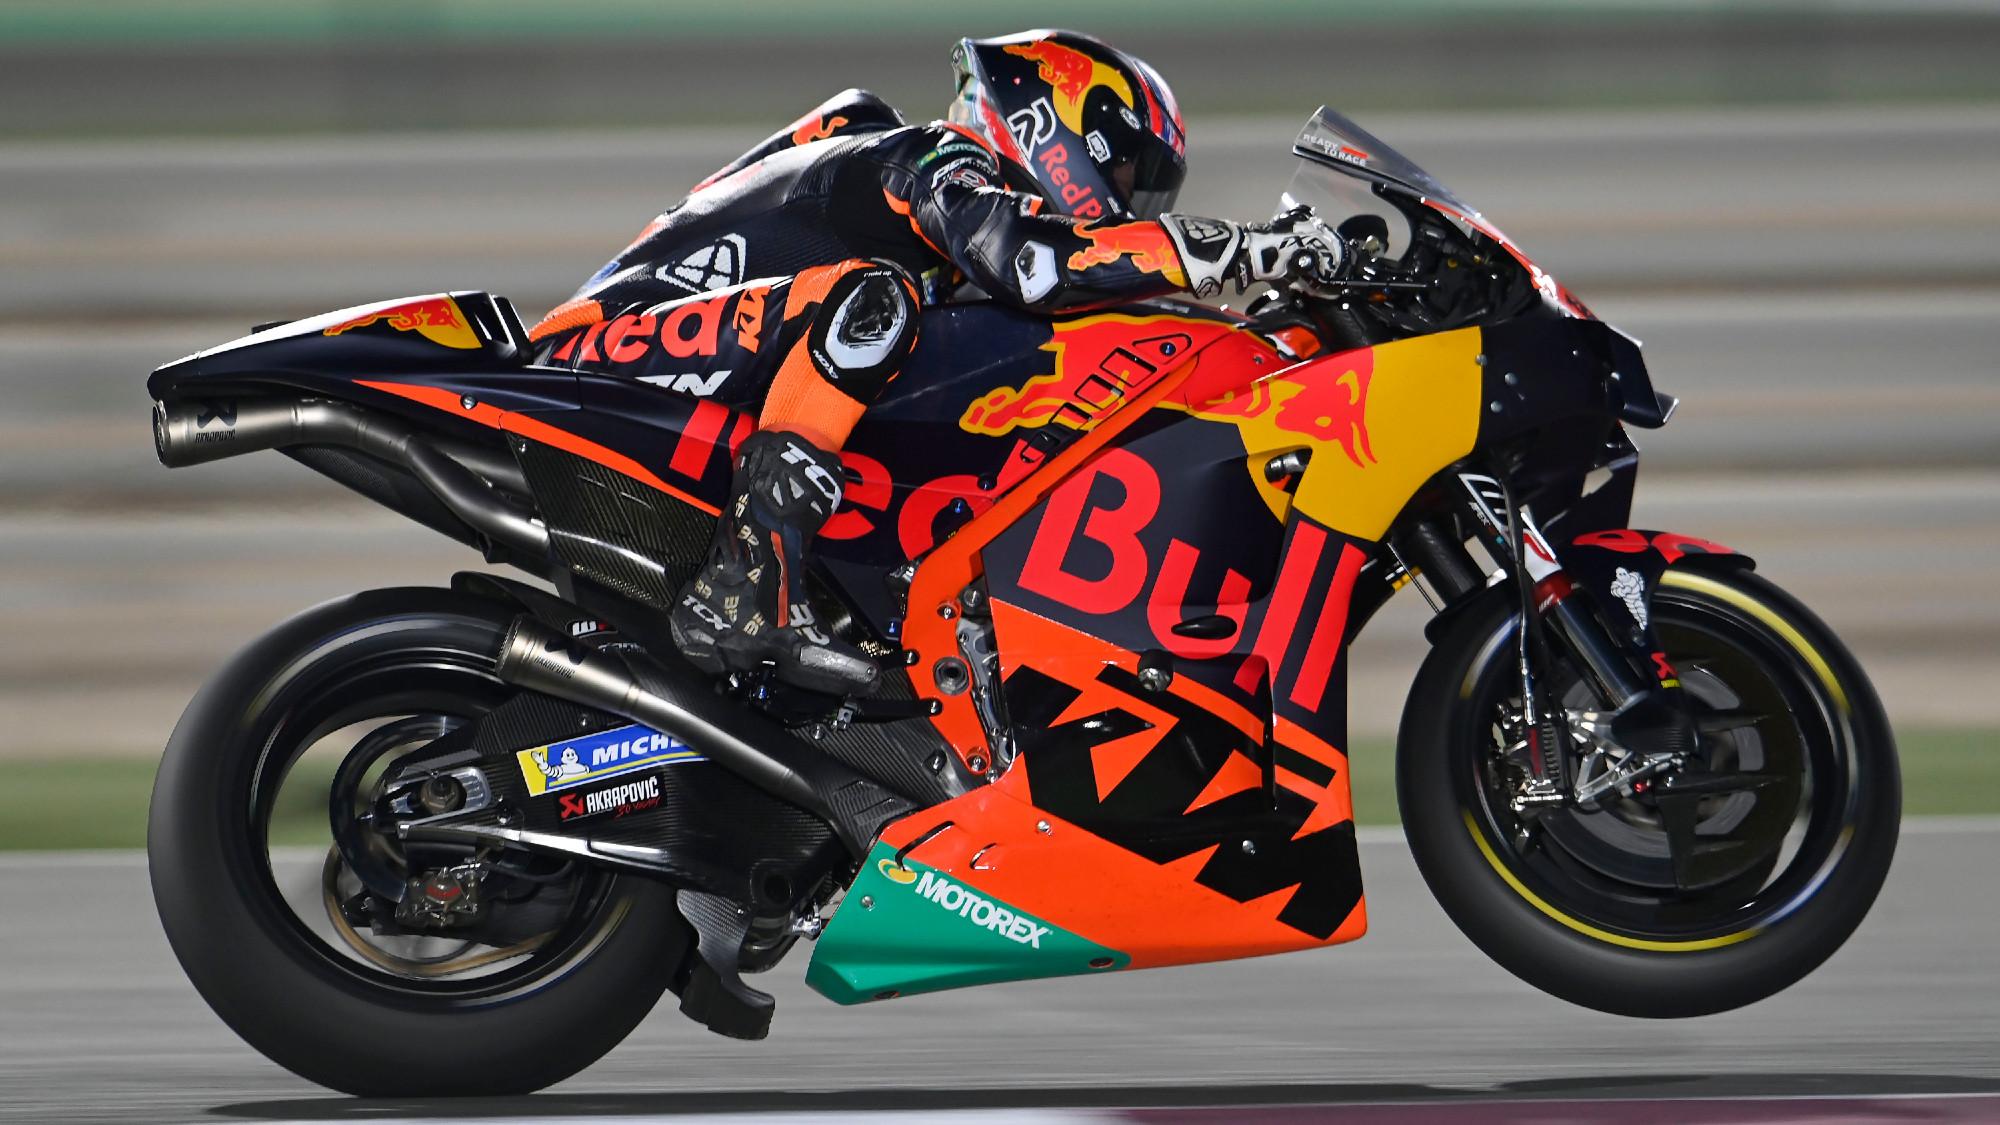 Brad Binder, 2021 Doha GP